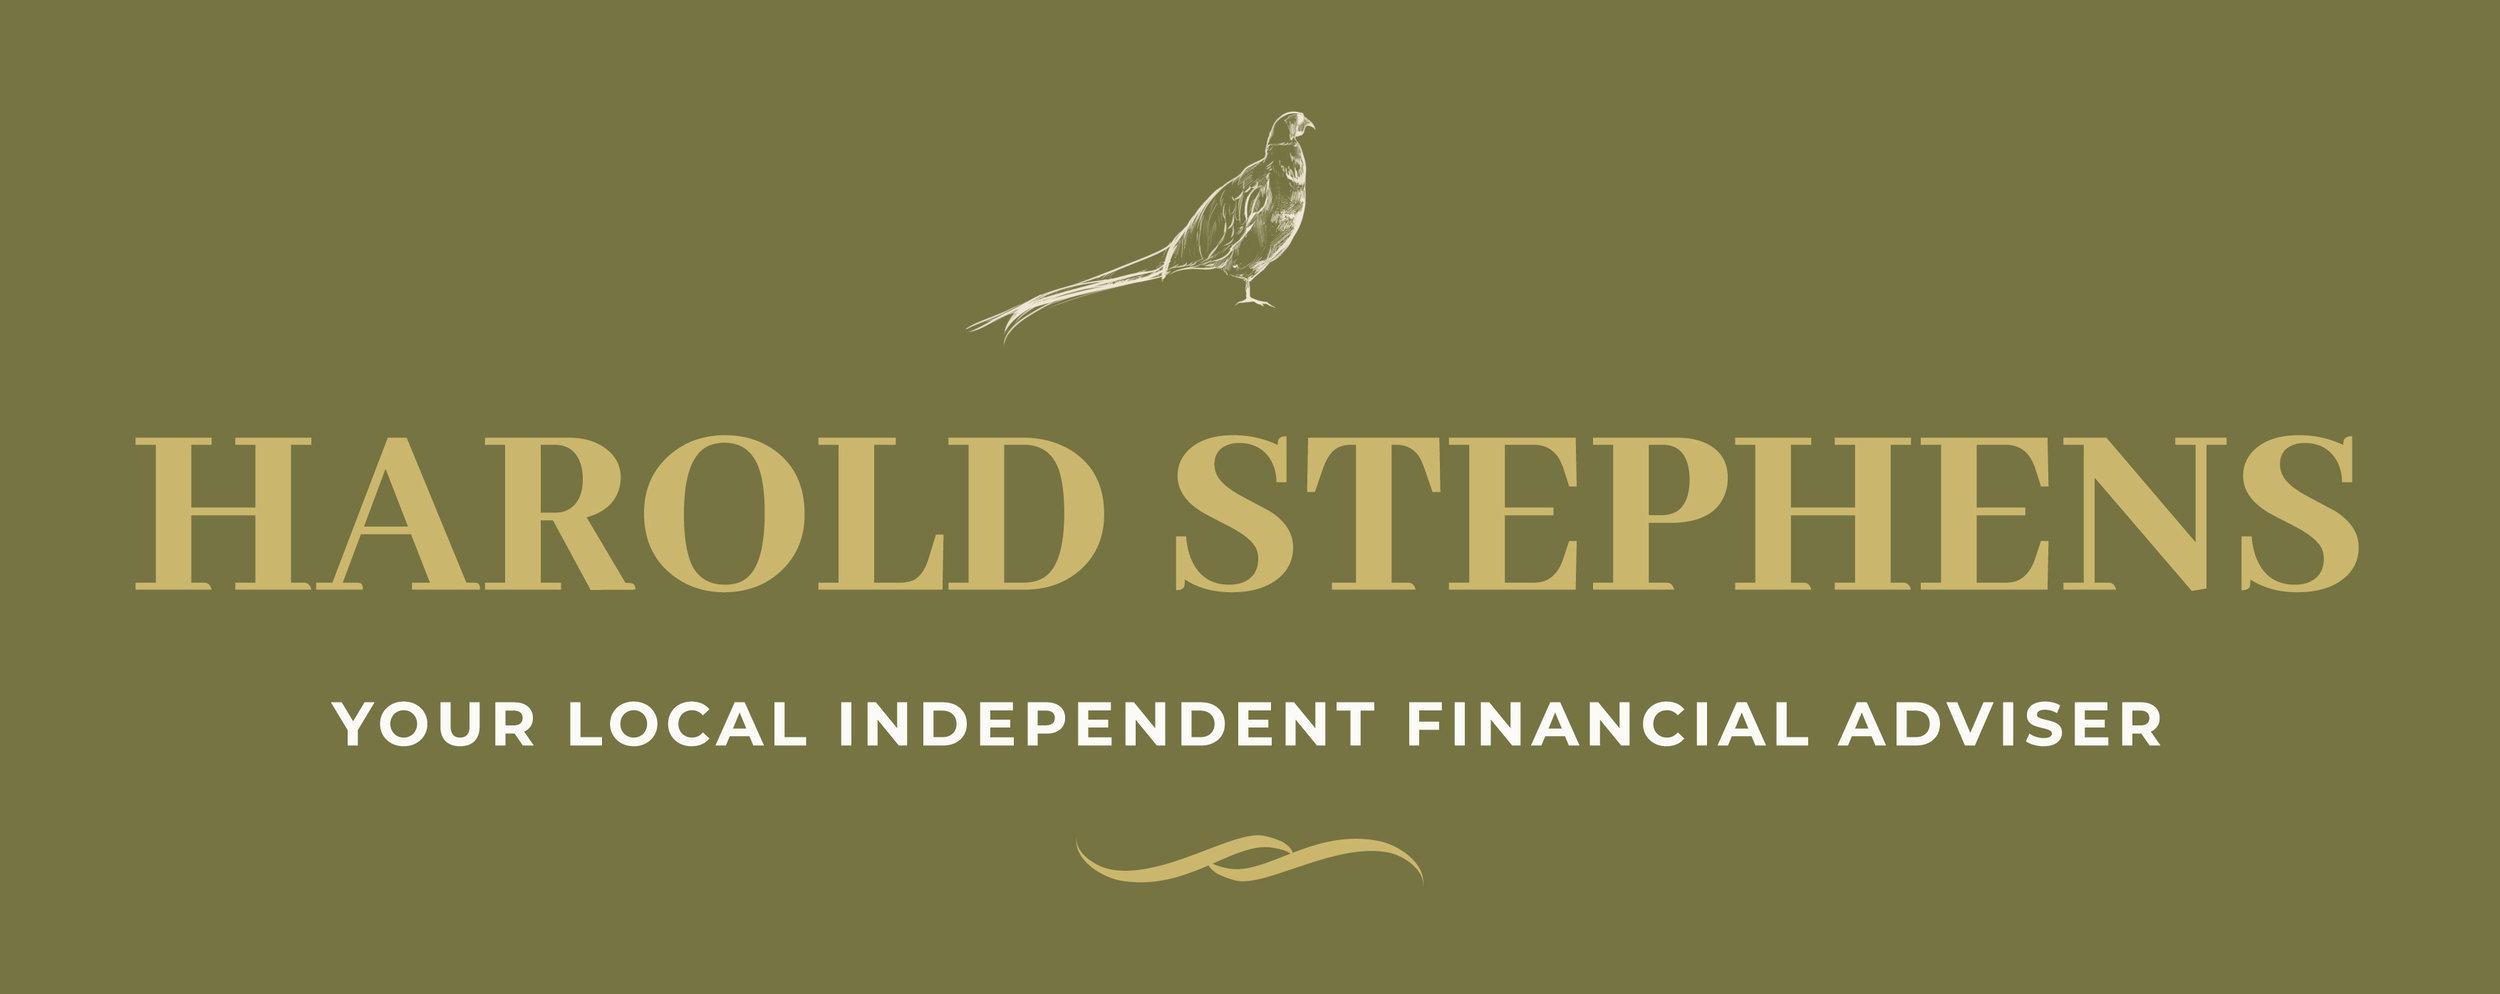 Harold-Stephens-logo-primary-yellow.jpg